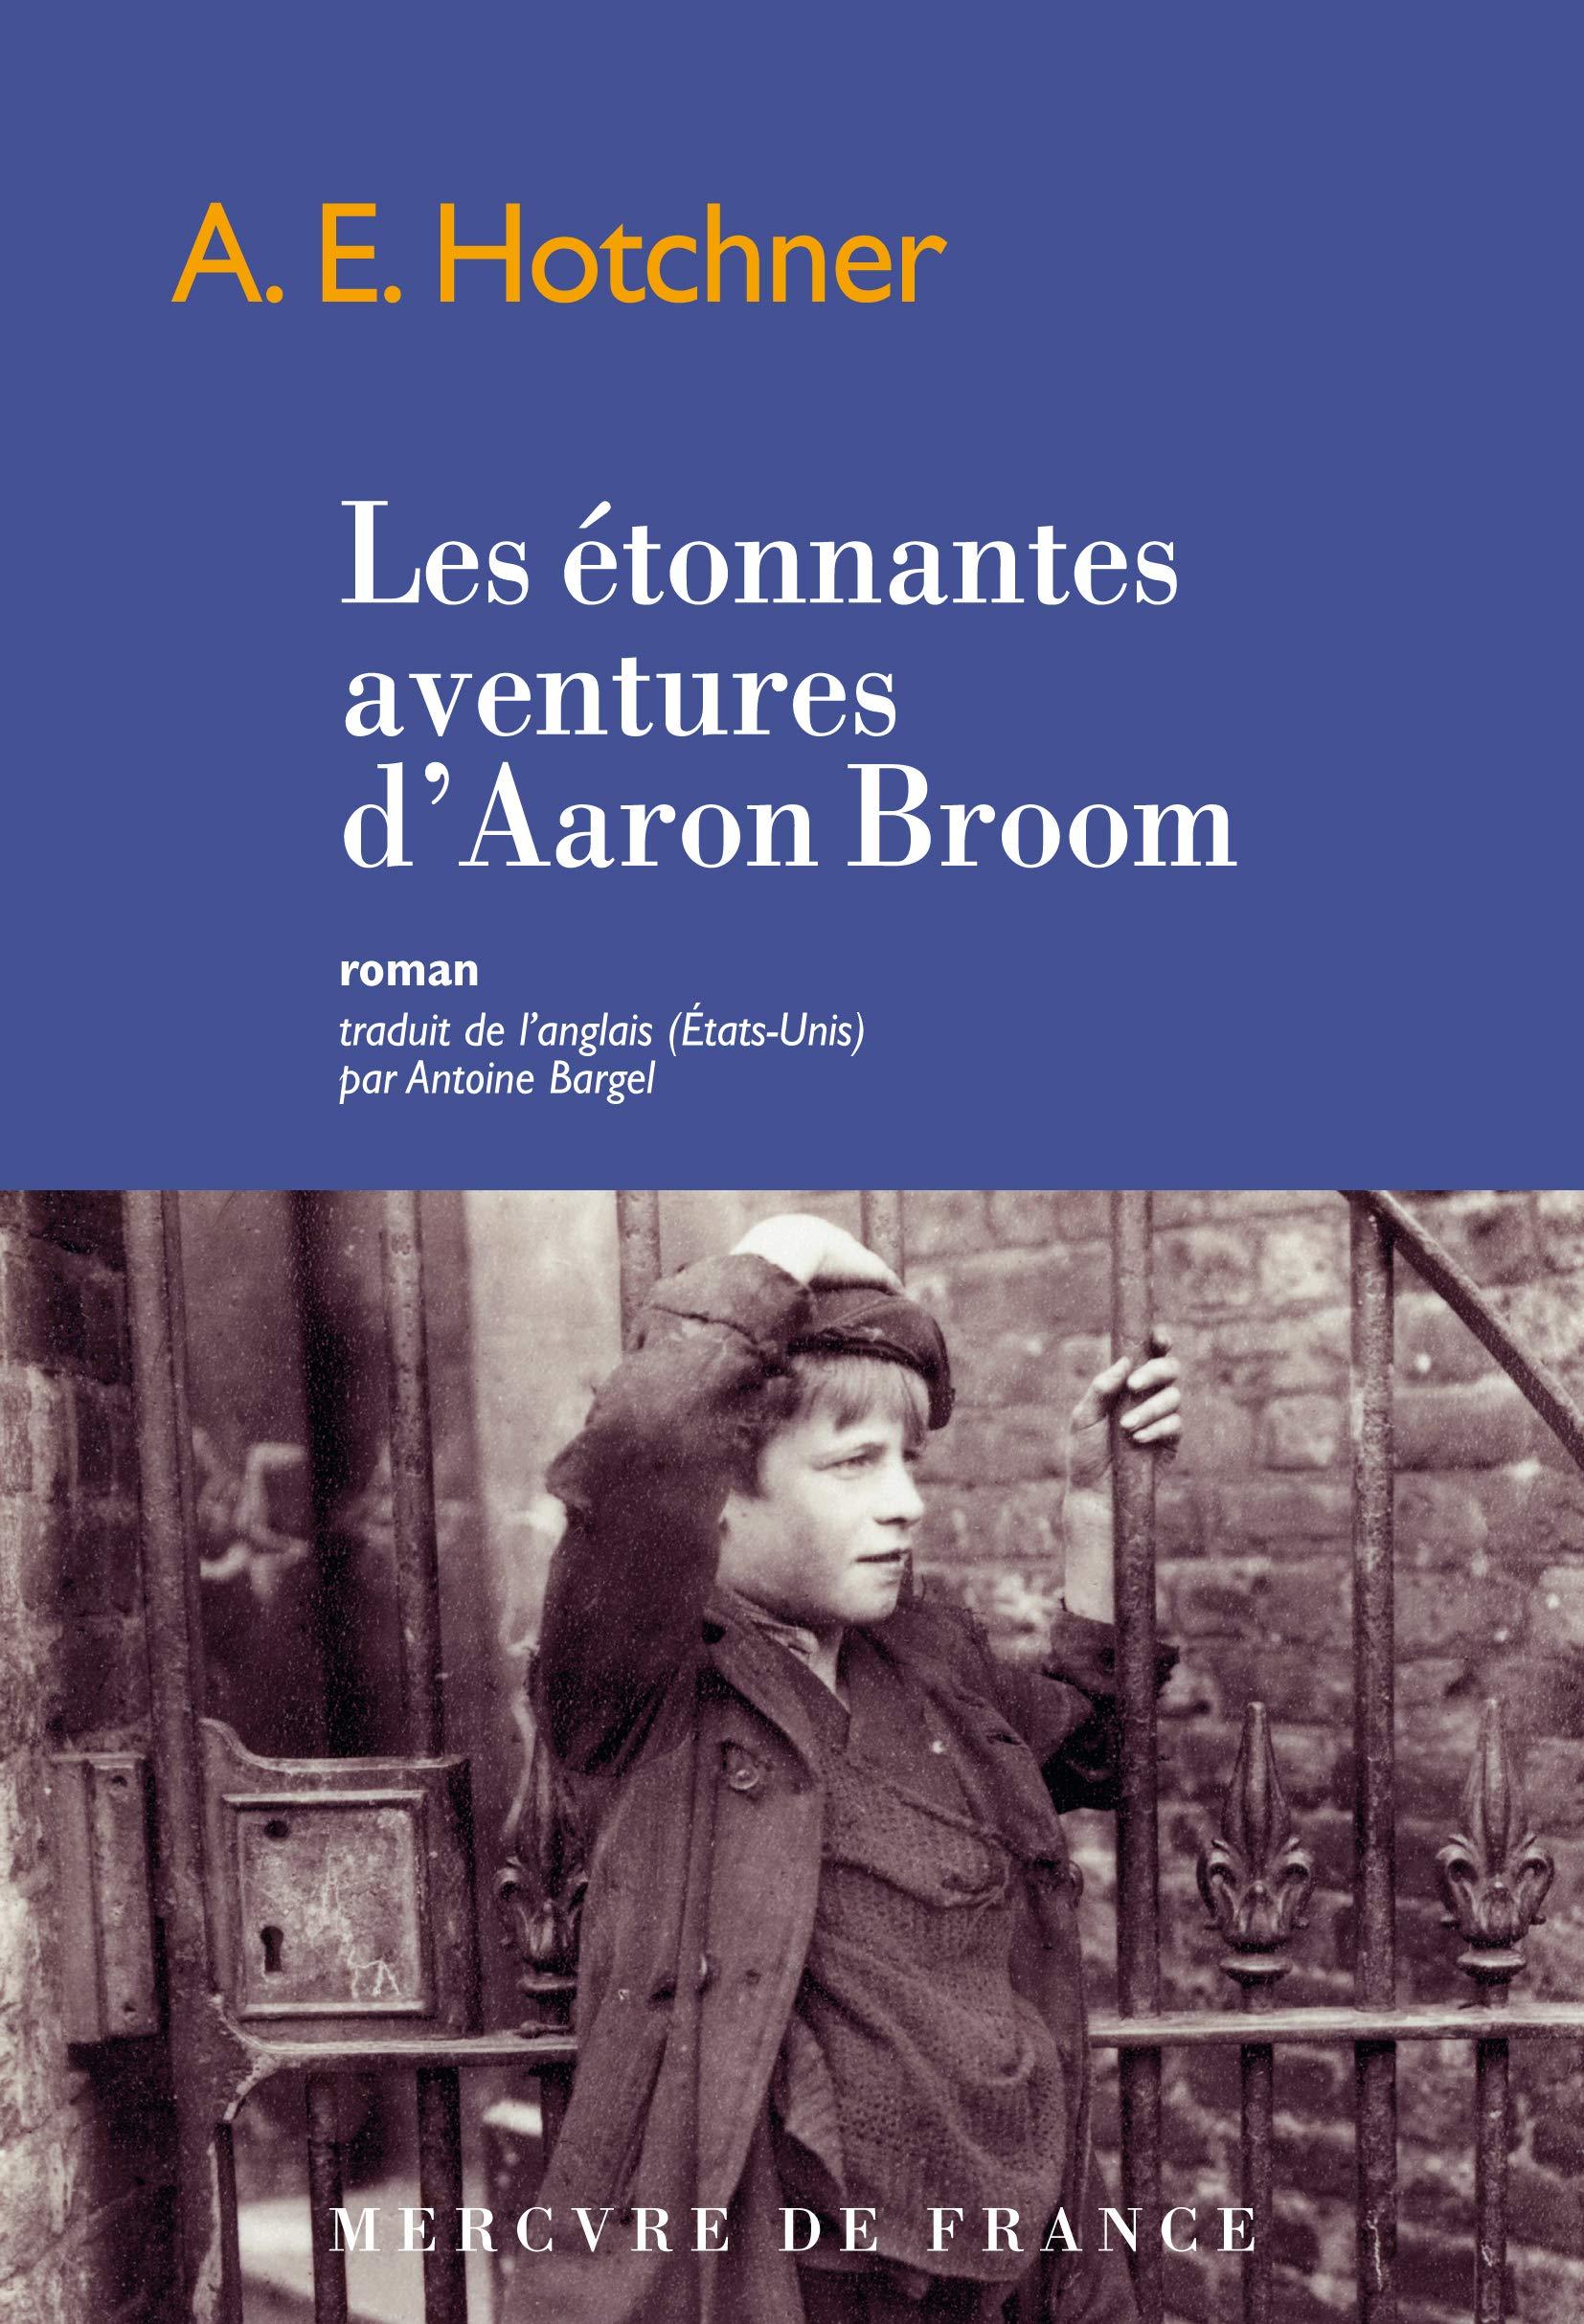 Les étonnantes aventures d'Aaron Broom